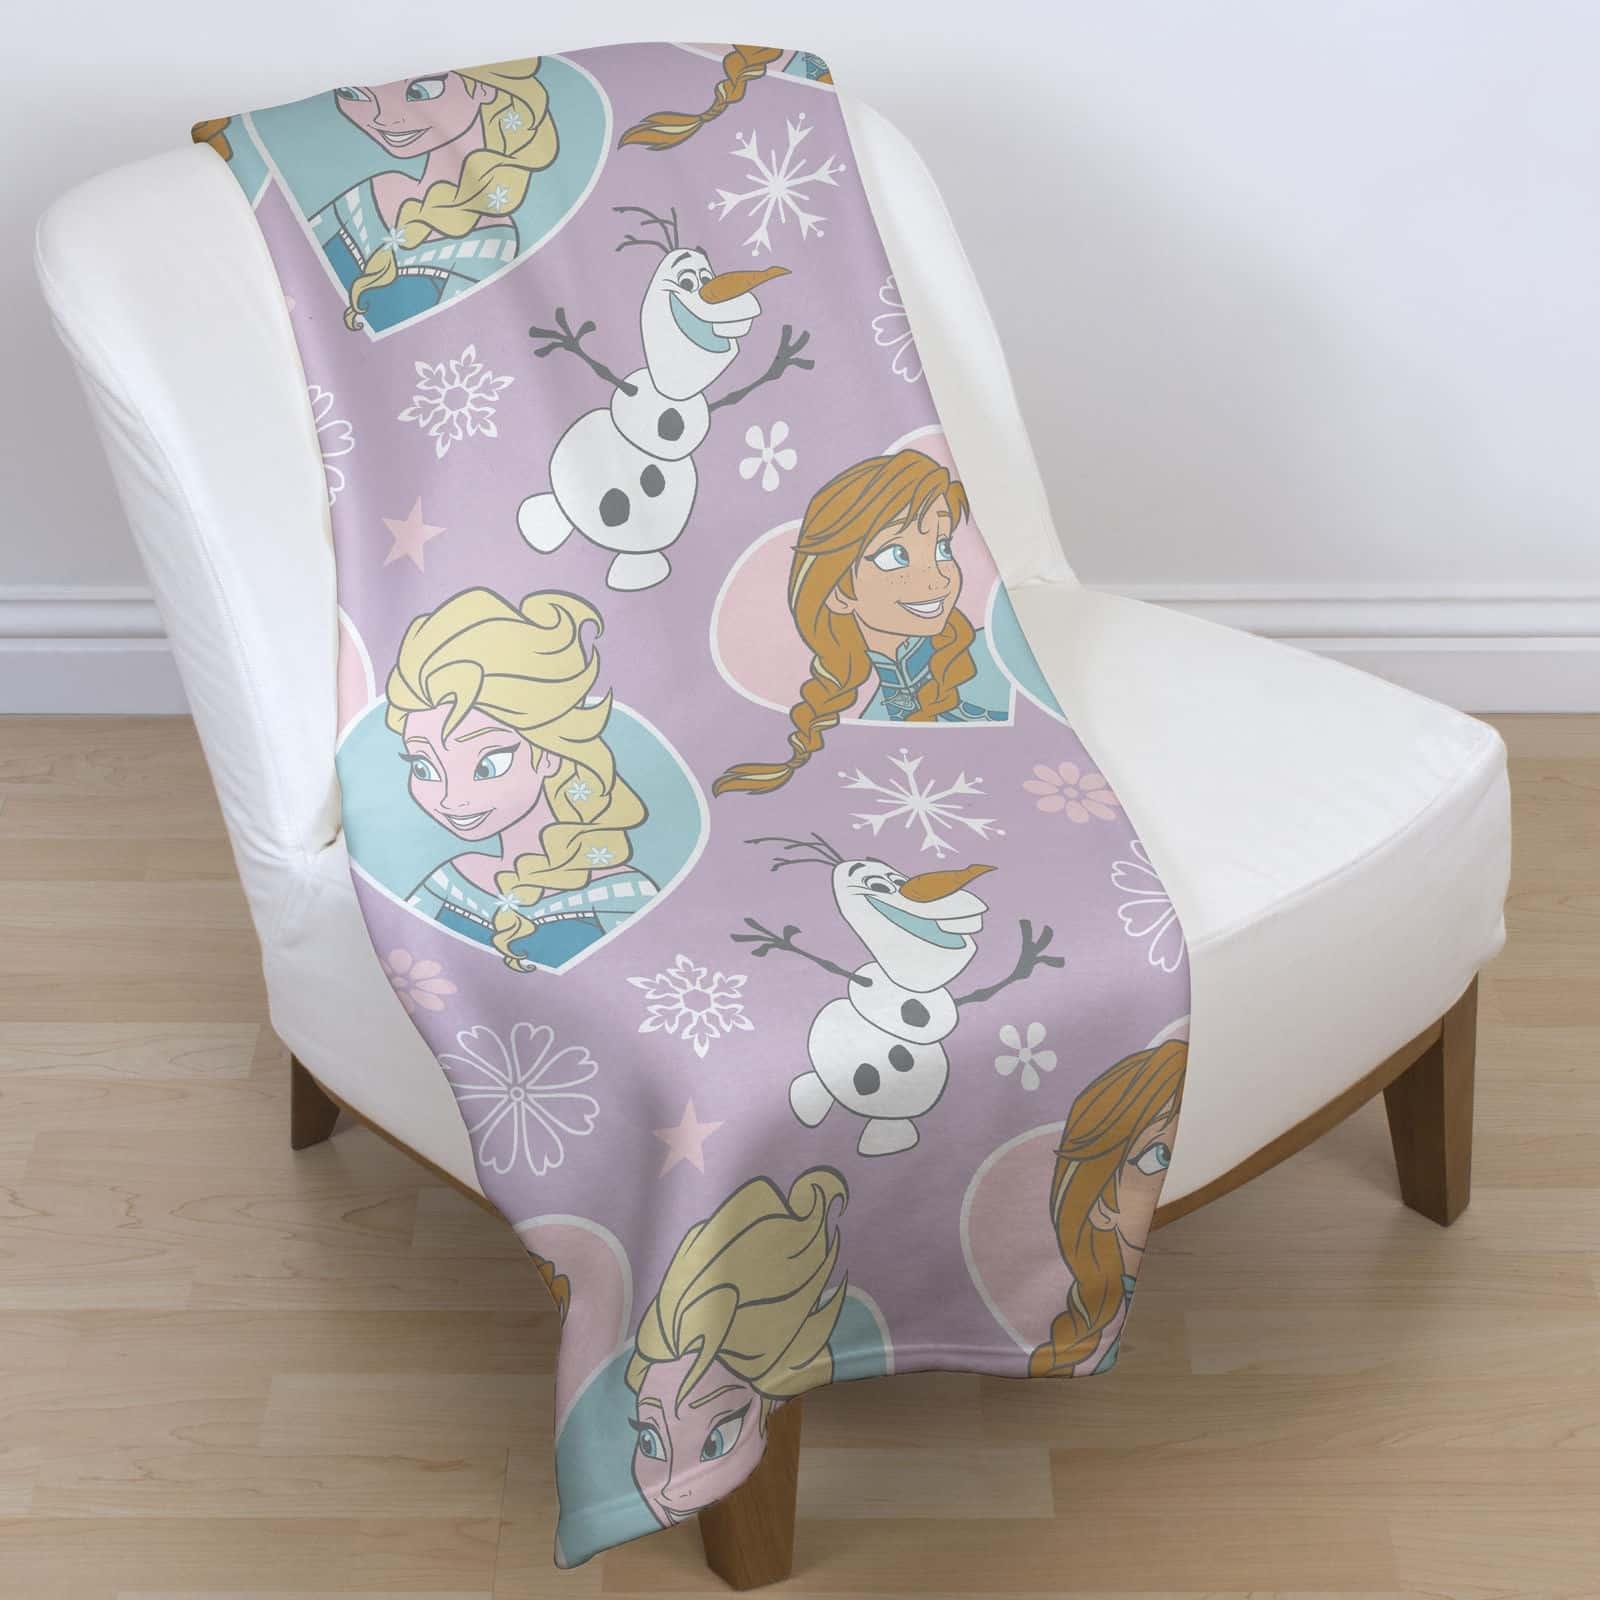 Childrens Character Fleece Blankets Kids Bedroom Gift Boys